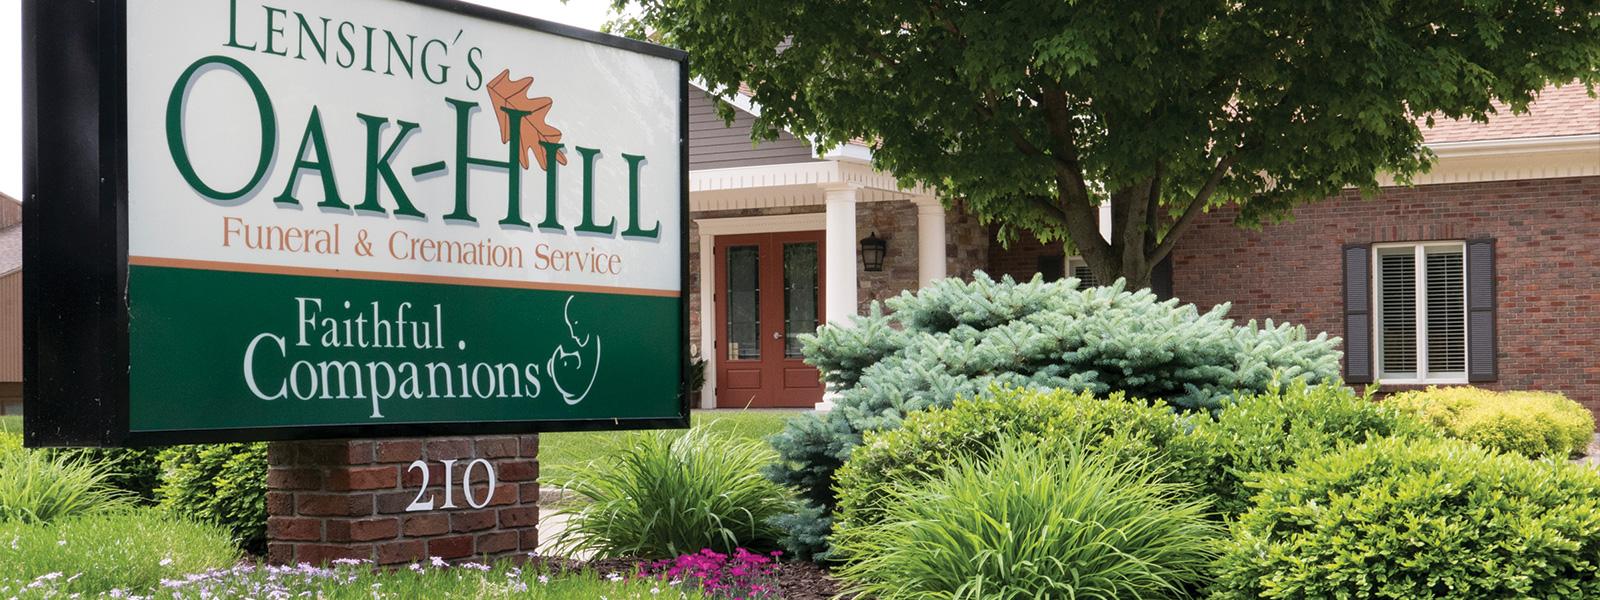 Lensing Funeral Cremation Iowa City Coralville - Garden-oak-funeral-home